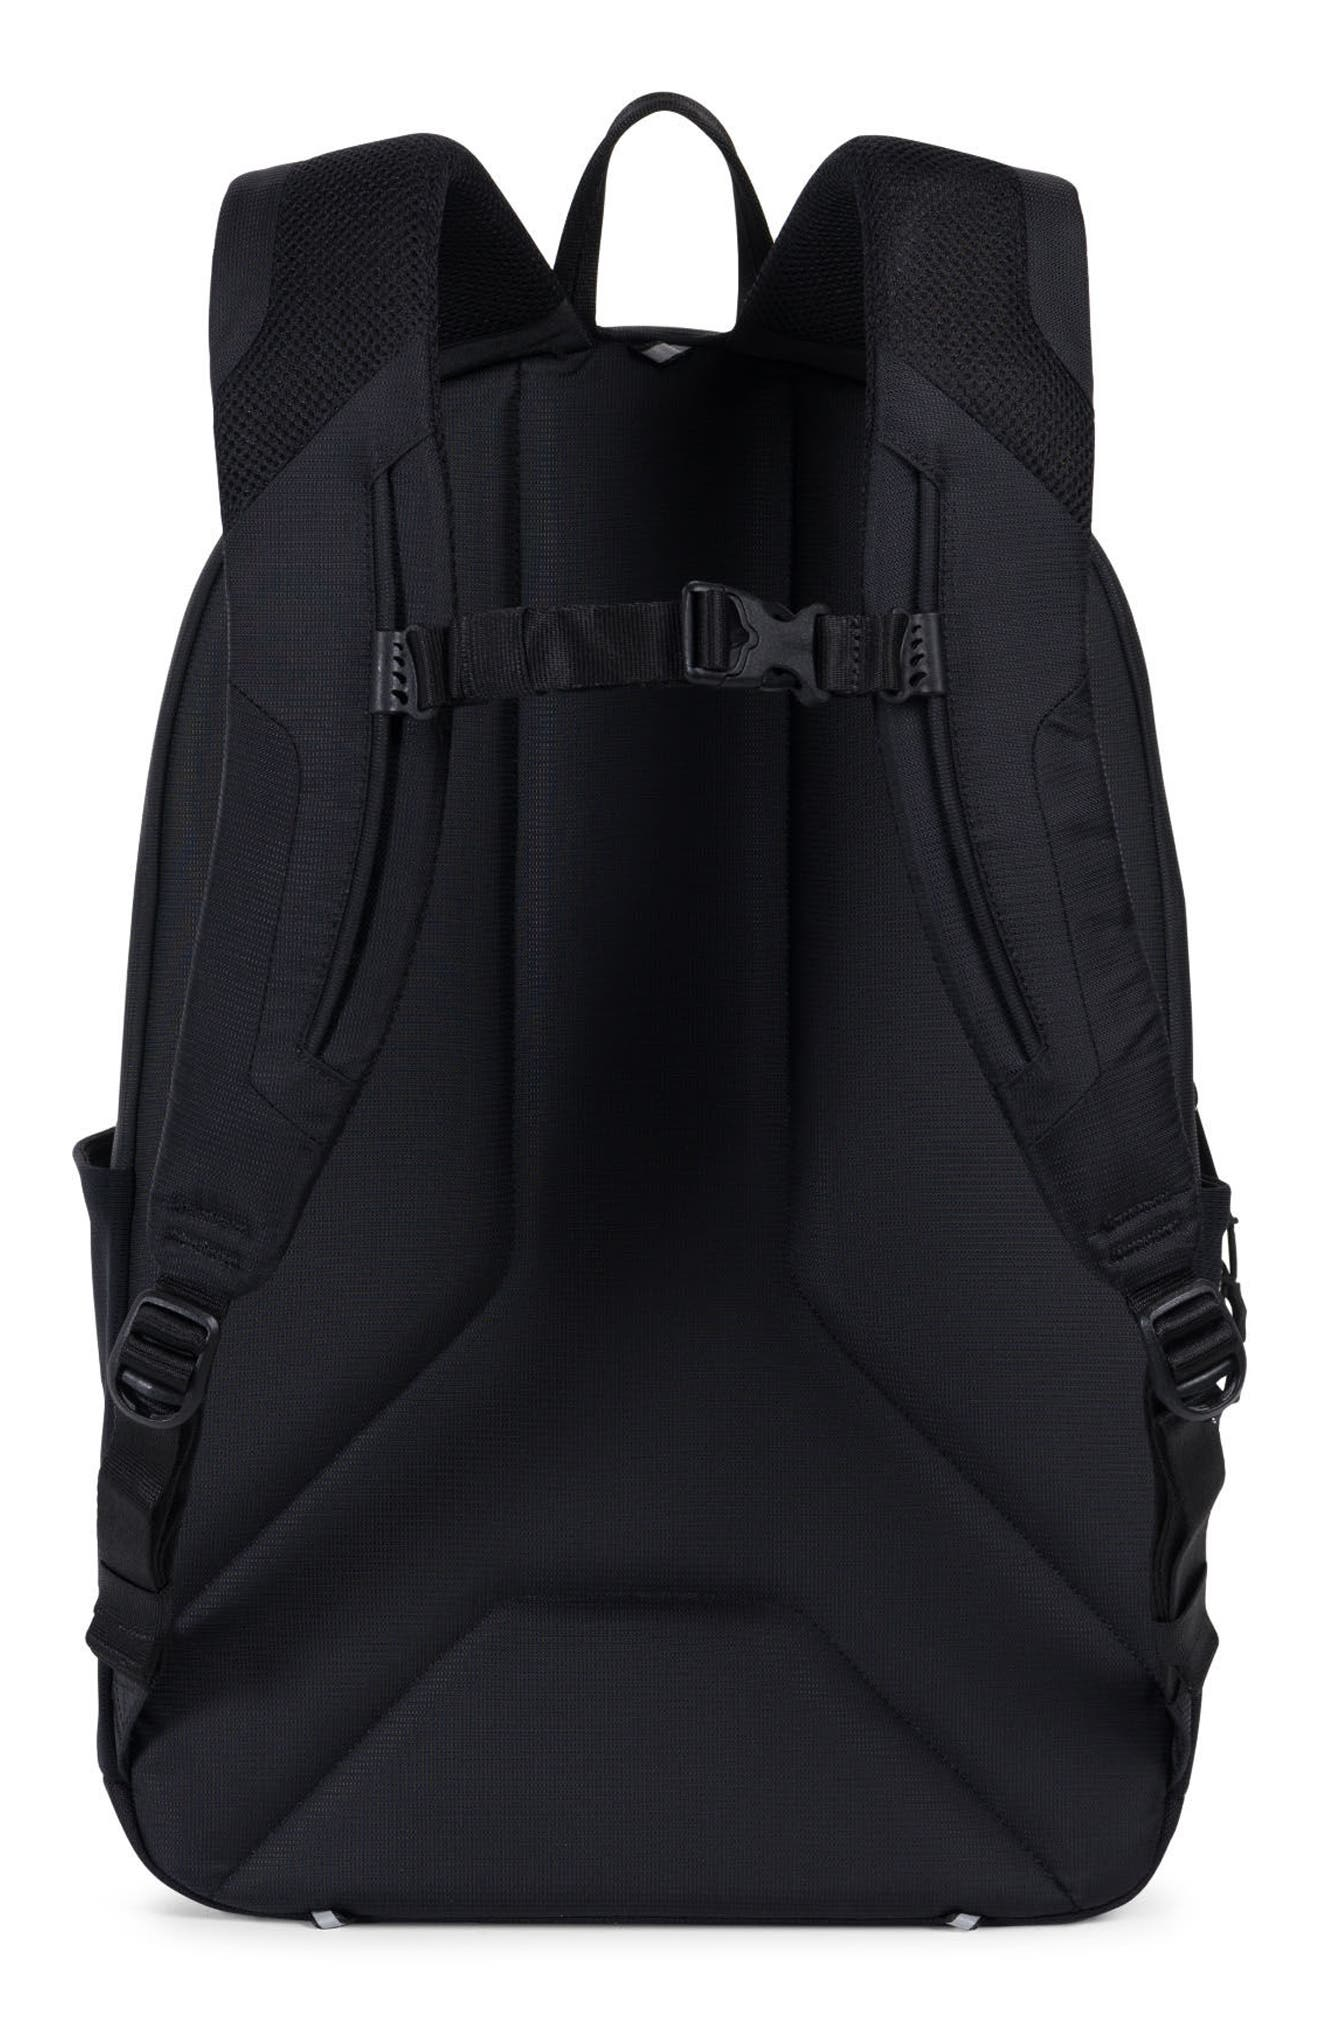 Rundle Trail Backpack,                             Alternate thumbnail 2, color,                             Black